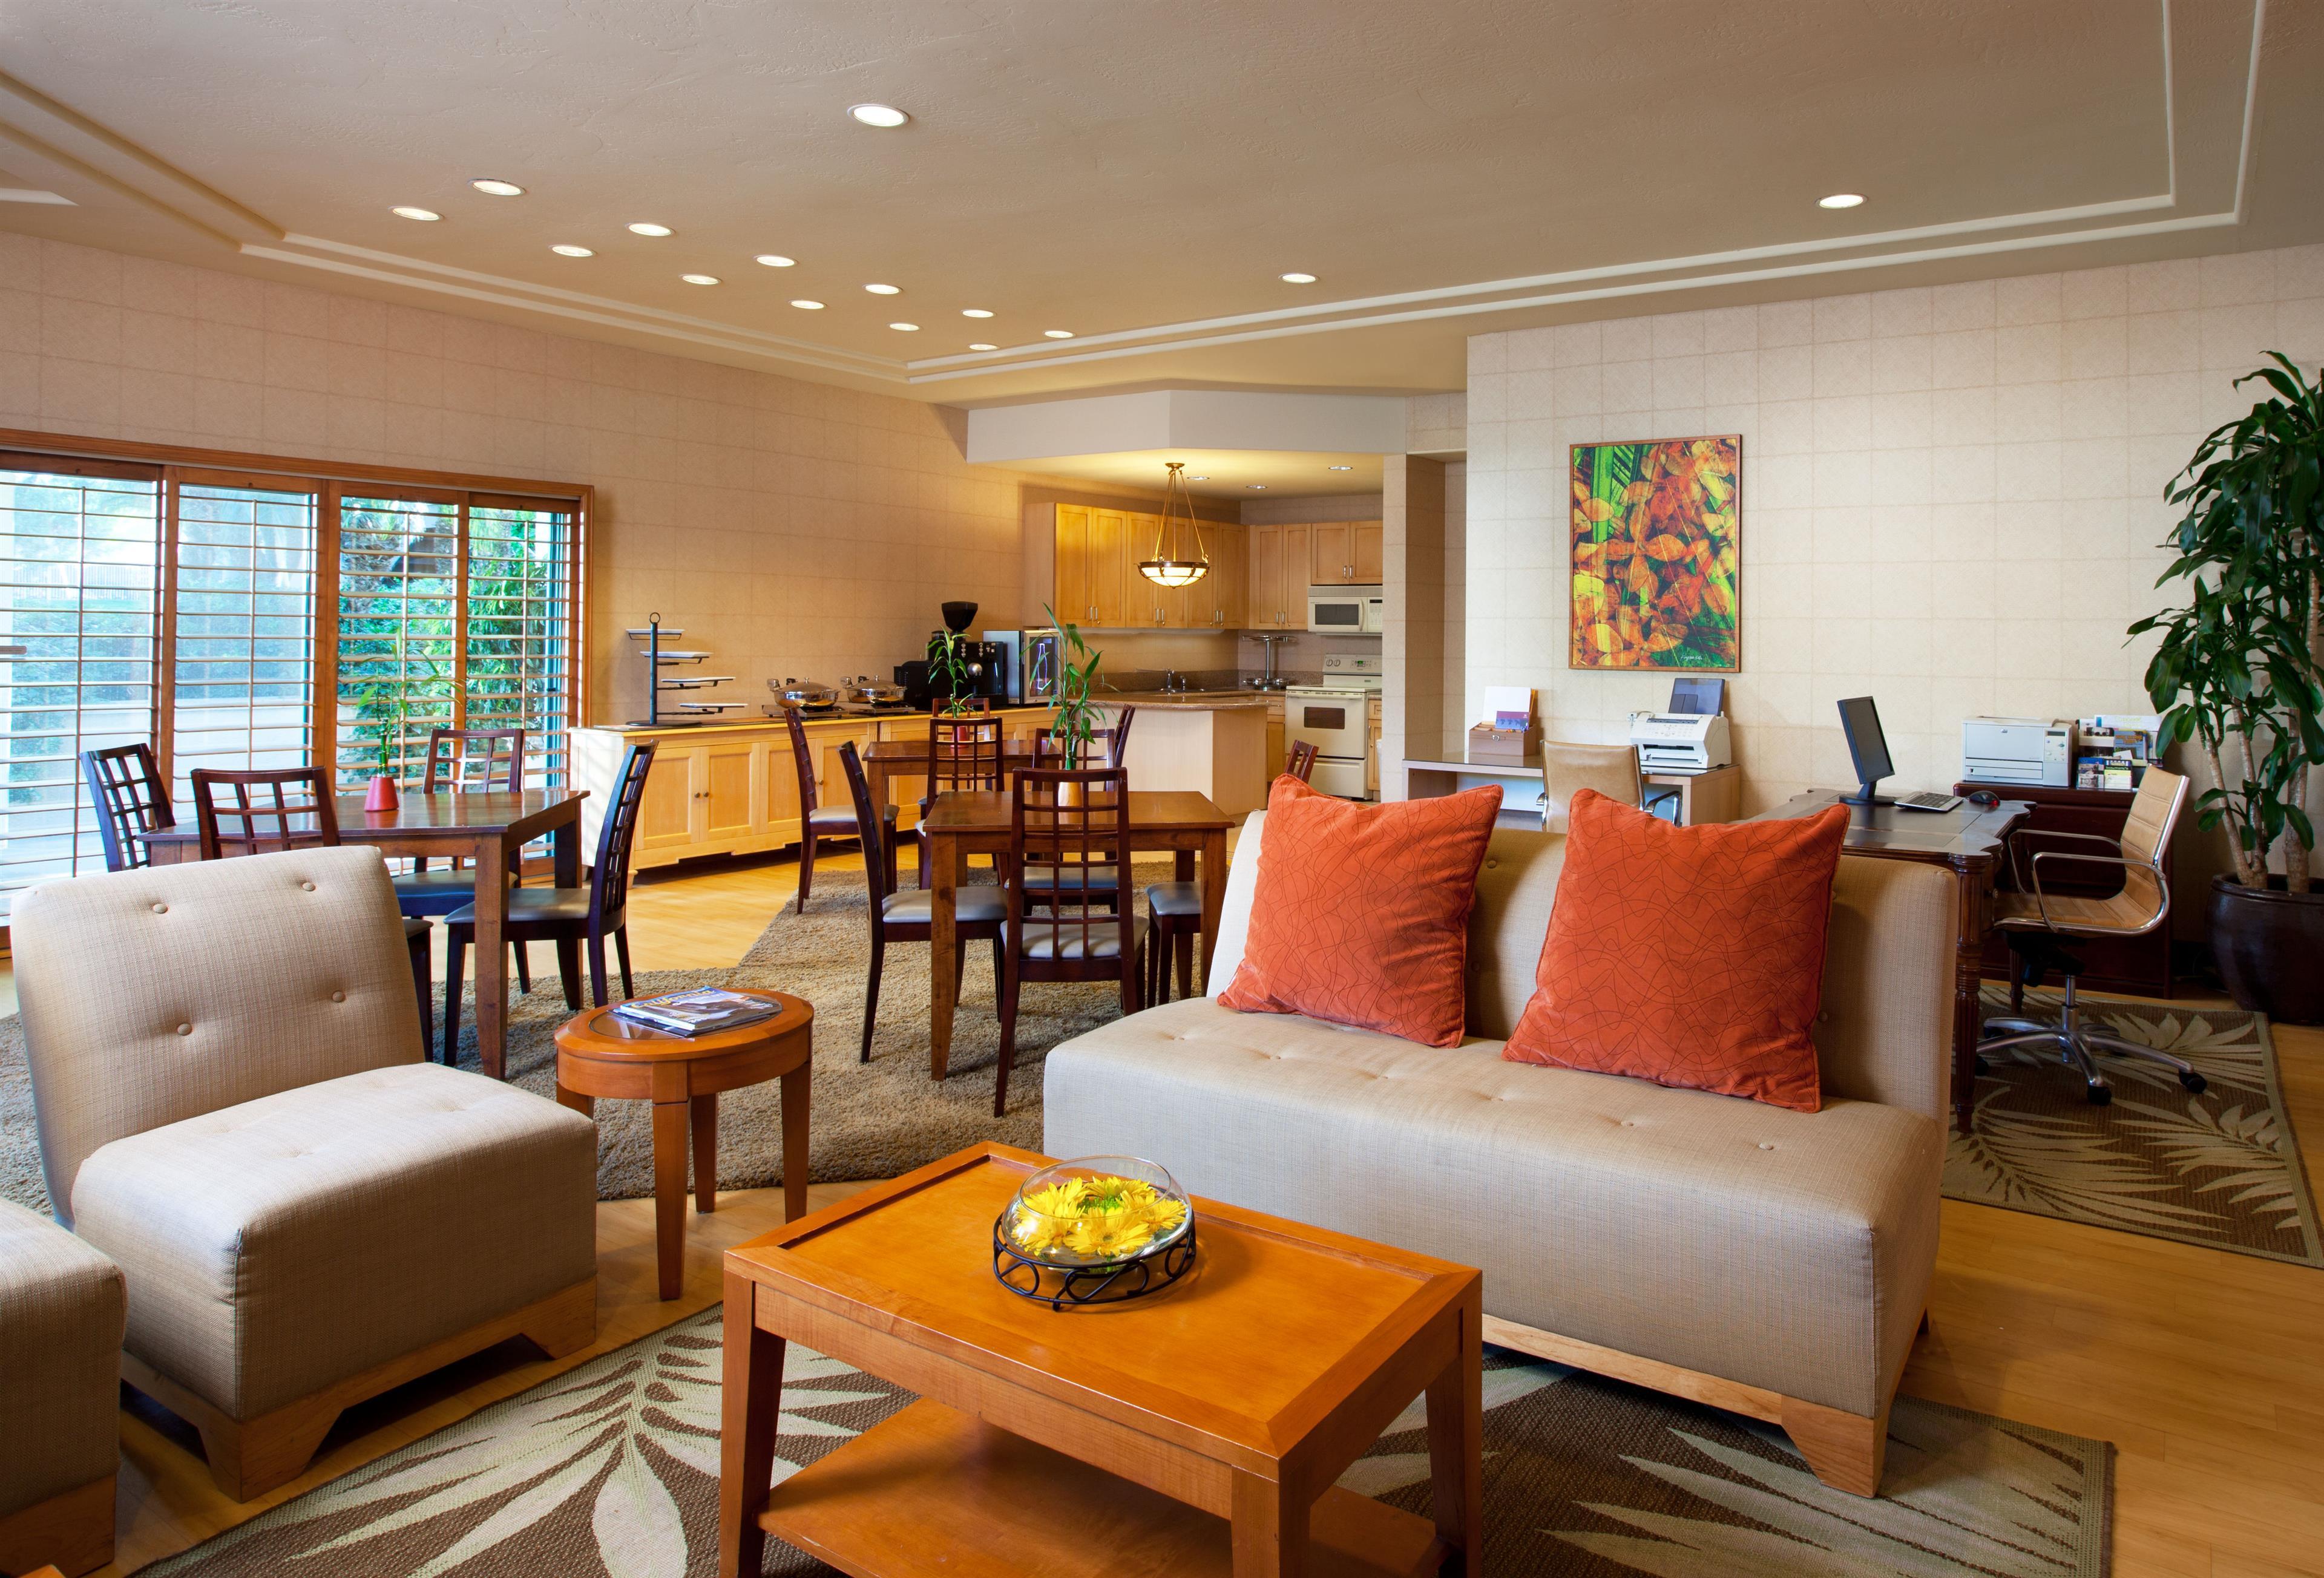 Sheraton La Jolla Hotel image 13